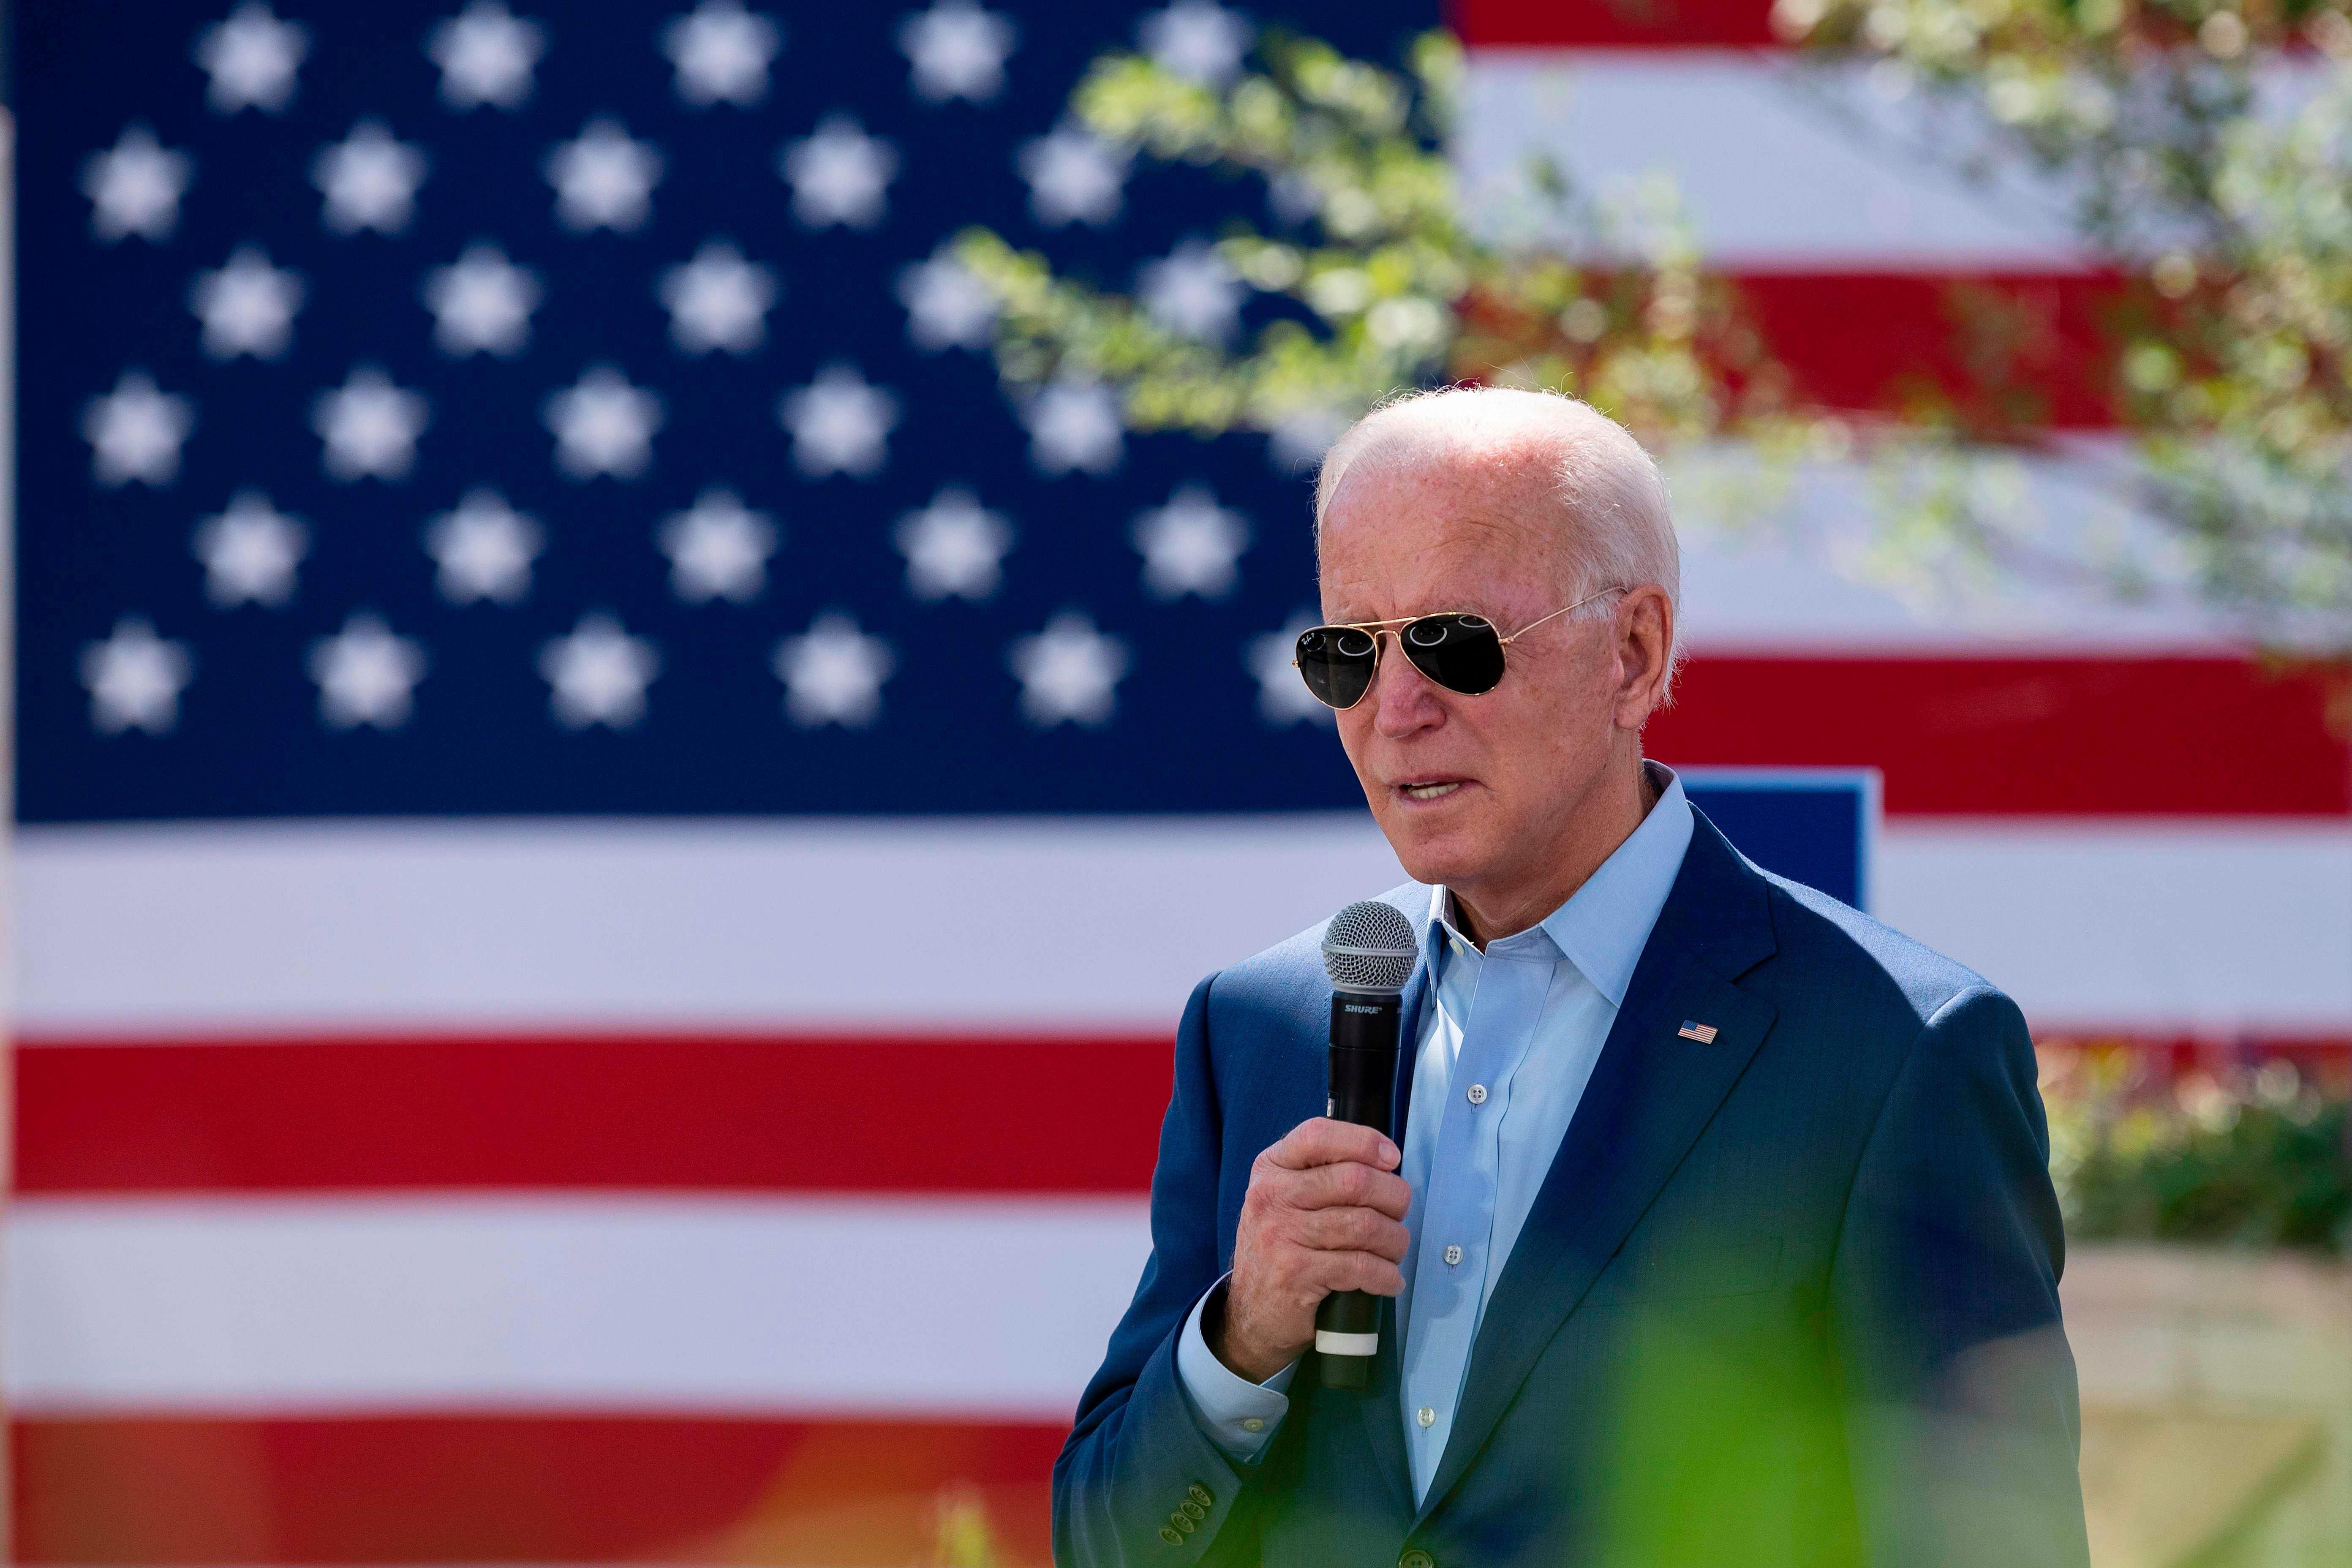 Presidential Debate Joe Biden Can Beat Donald Trump By Being An Adult